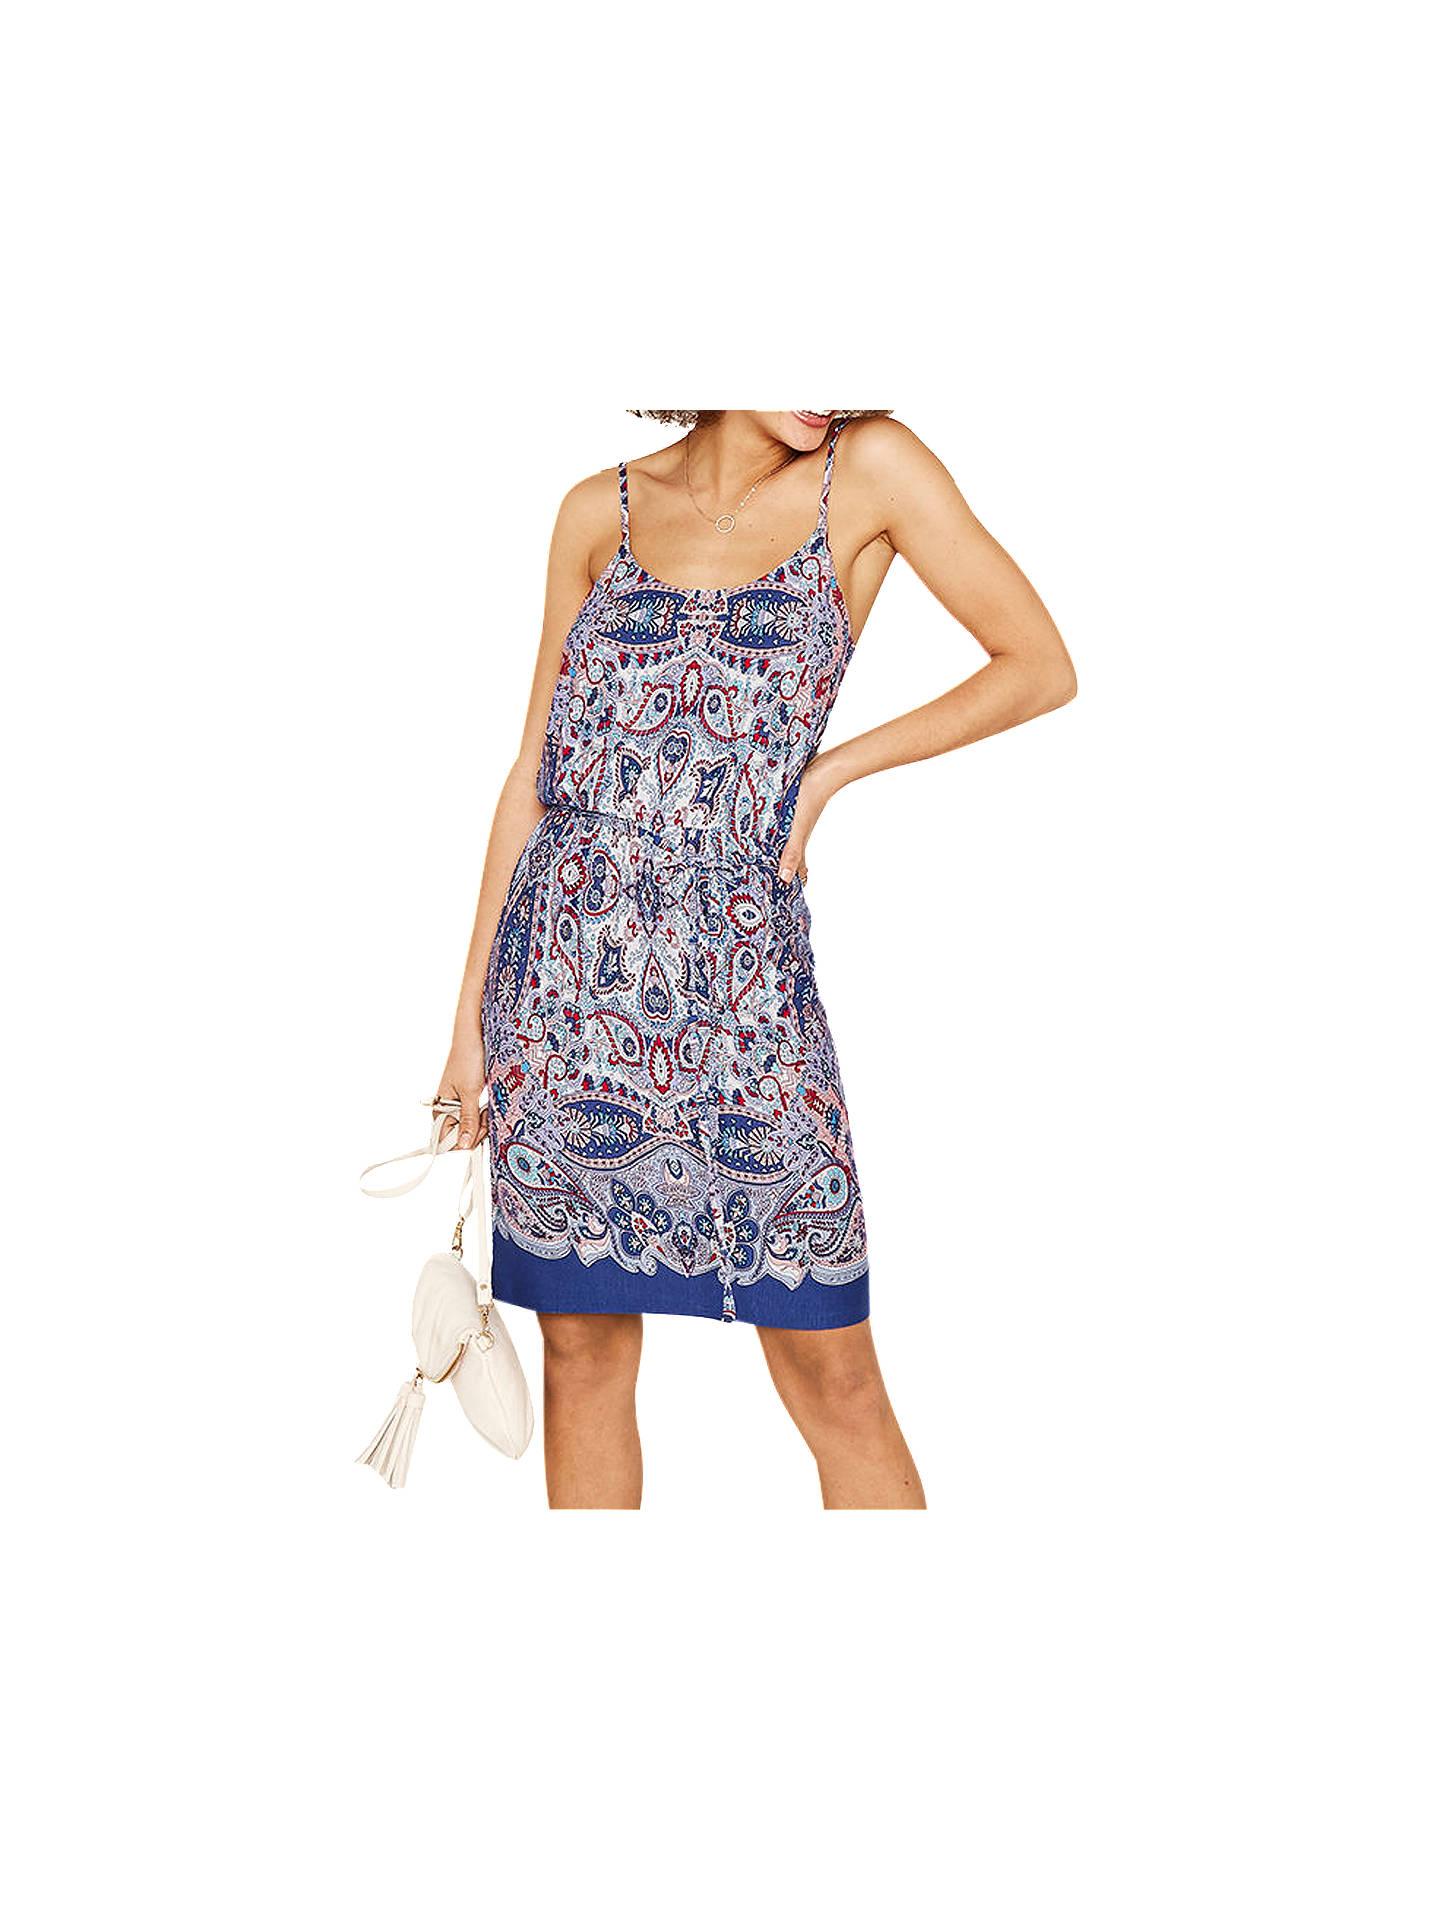 d859595ea211 ... Buy Oasis Paisley Cami Dress, Multi, S Online at johnlewis.com ...